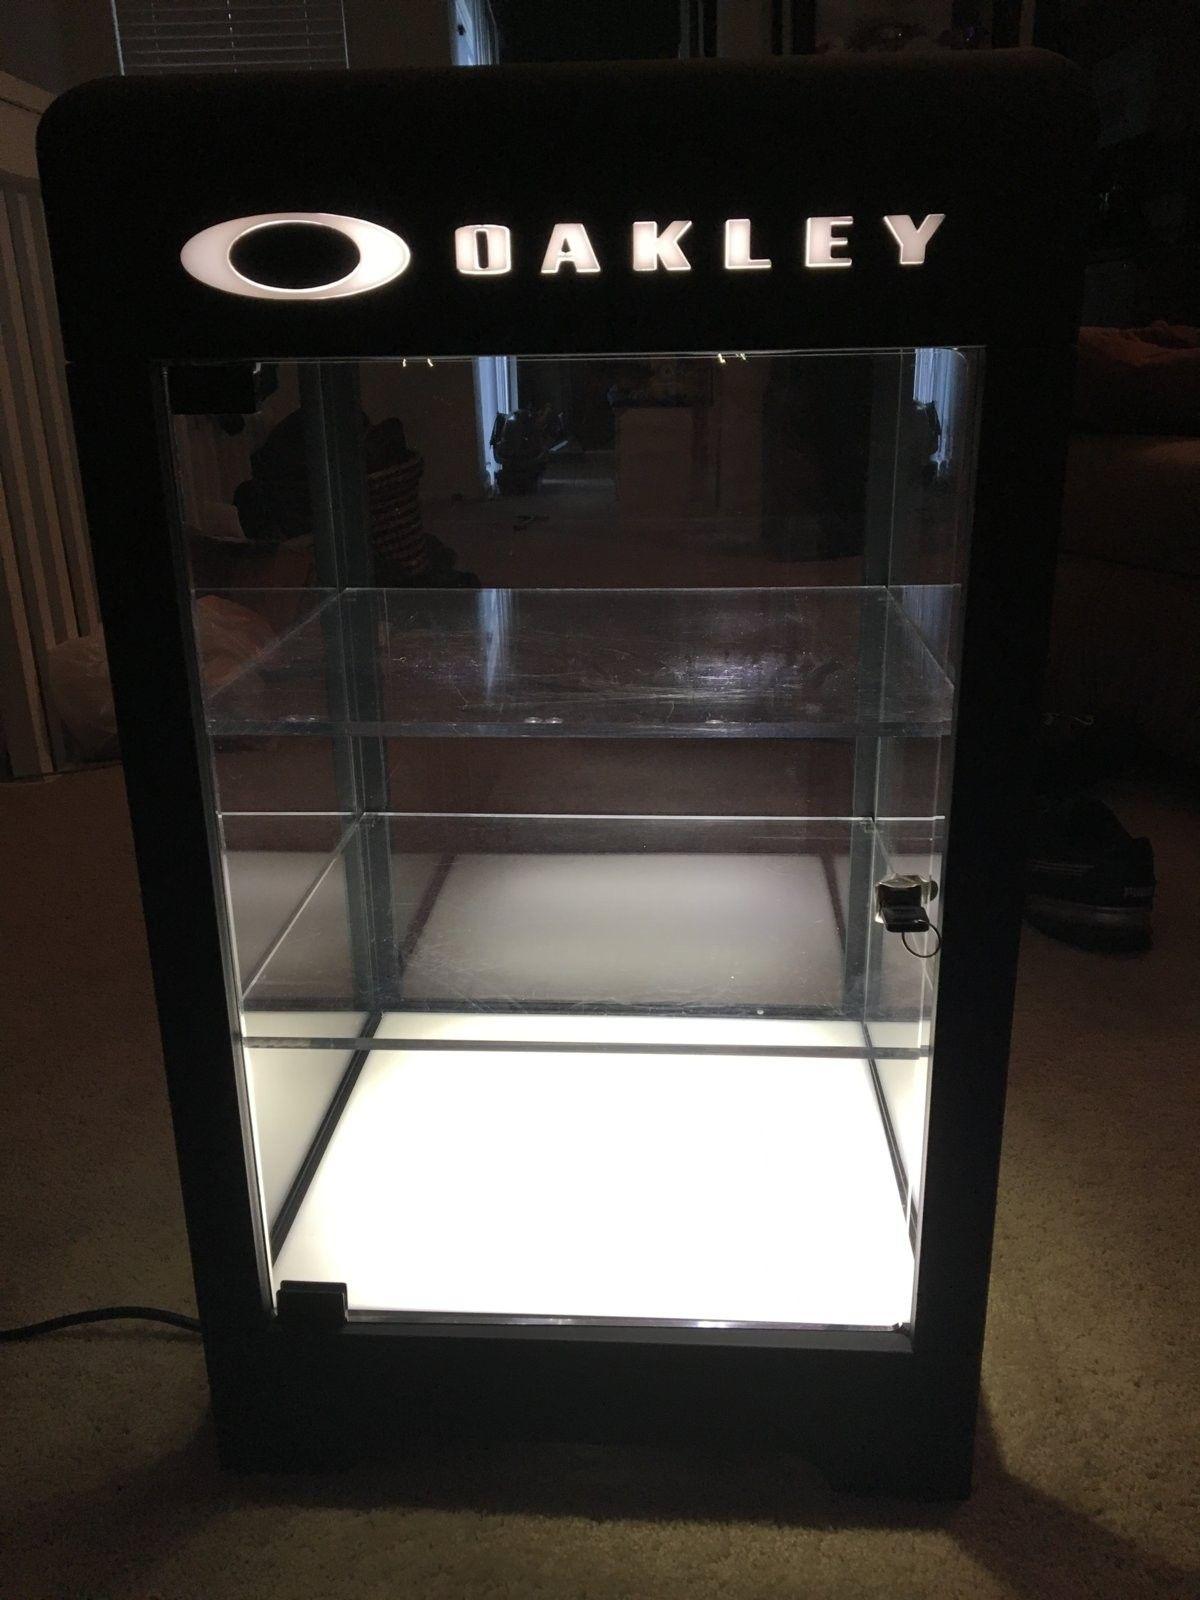 Oakley Counter Top Display 3.0 - image.jpeg